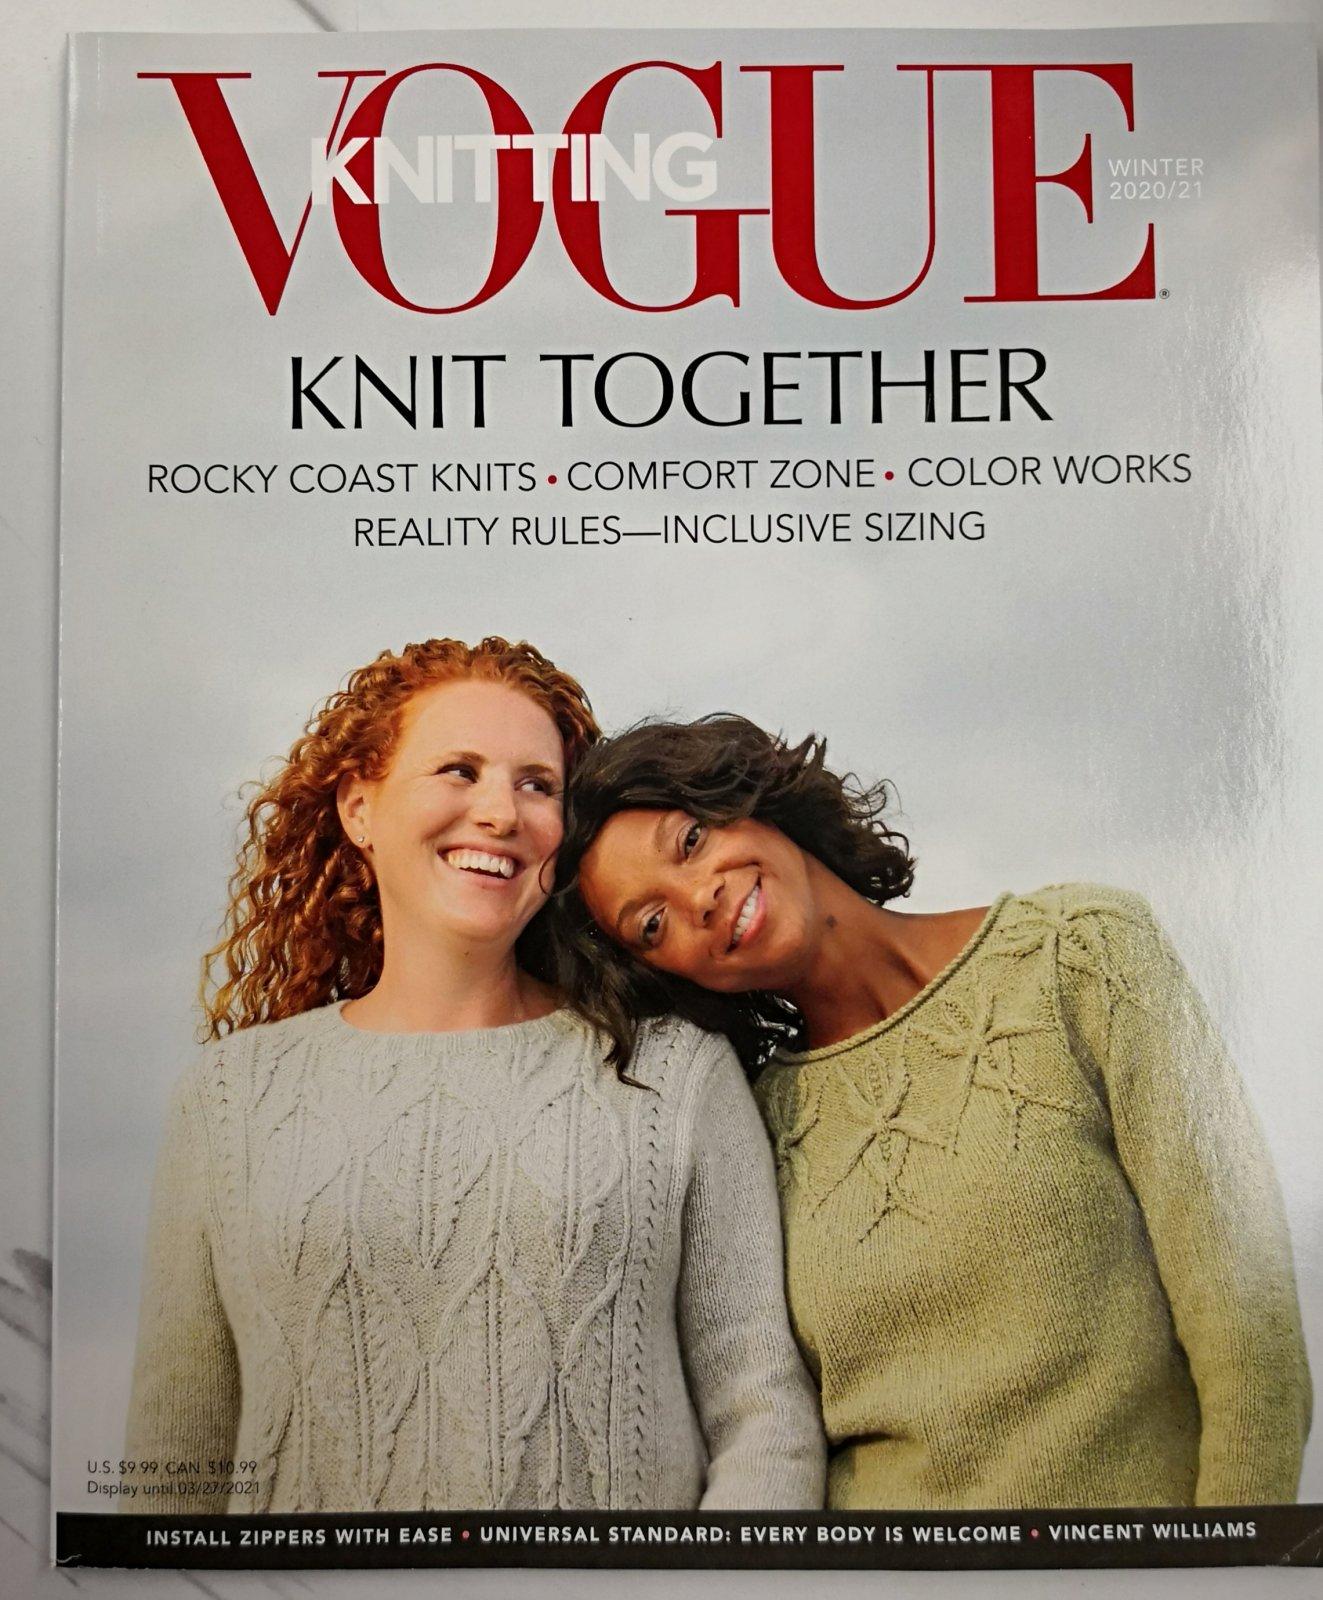 Vogue Knitting Winter 2020/2021